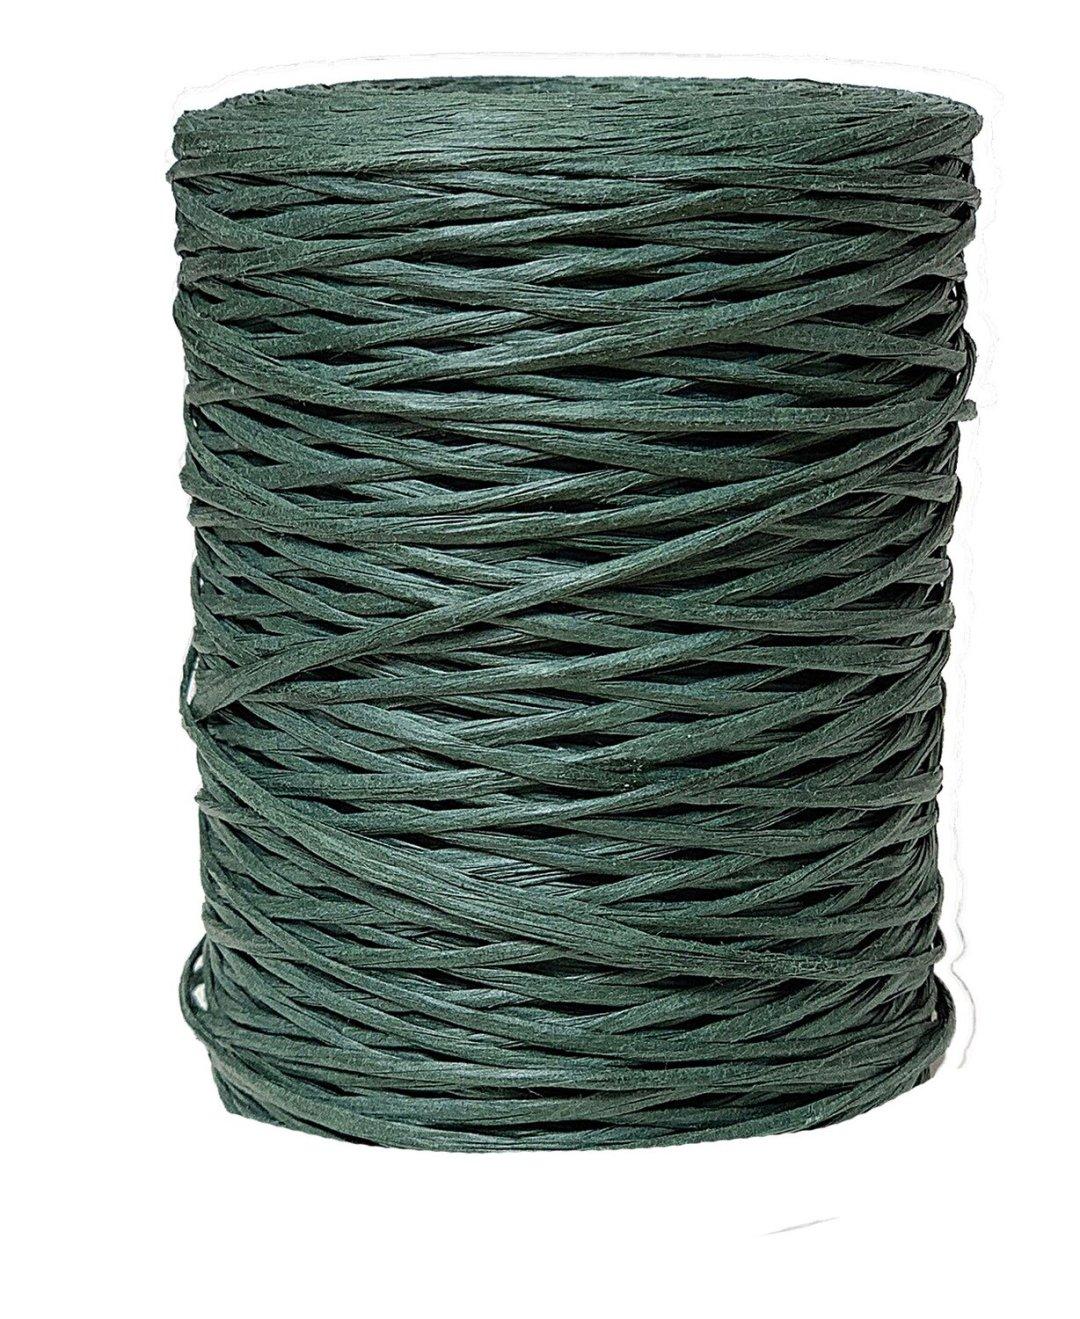 FS315GRN - 35 mm green Bind wire 673 feet $9.85 each Minimum order: 1 pc Case Pack: 24 pcs